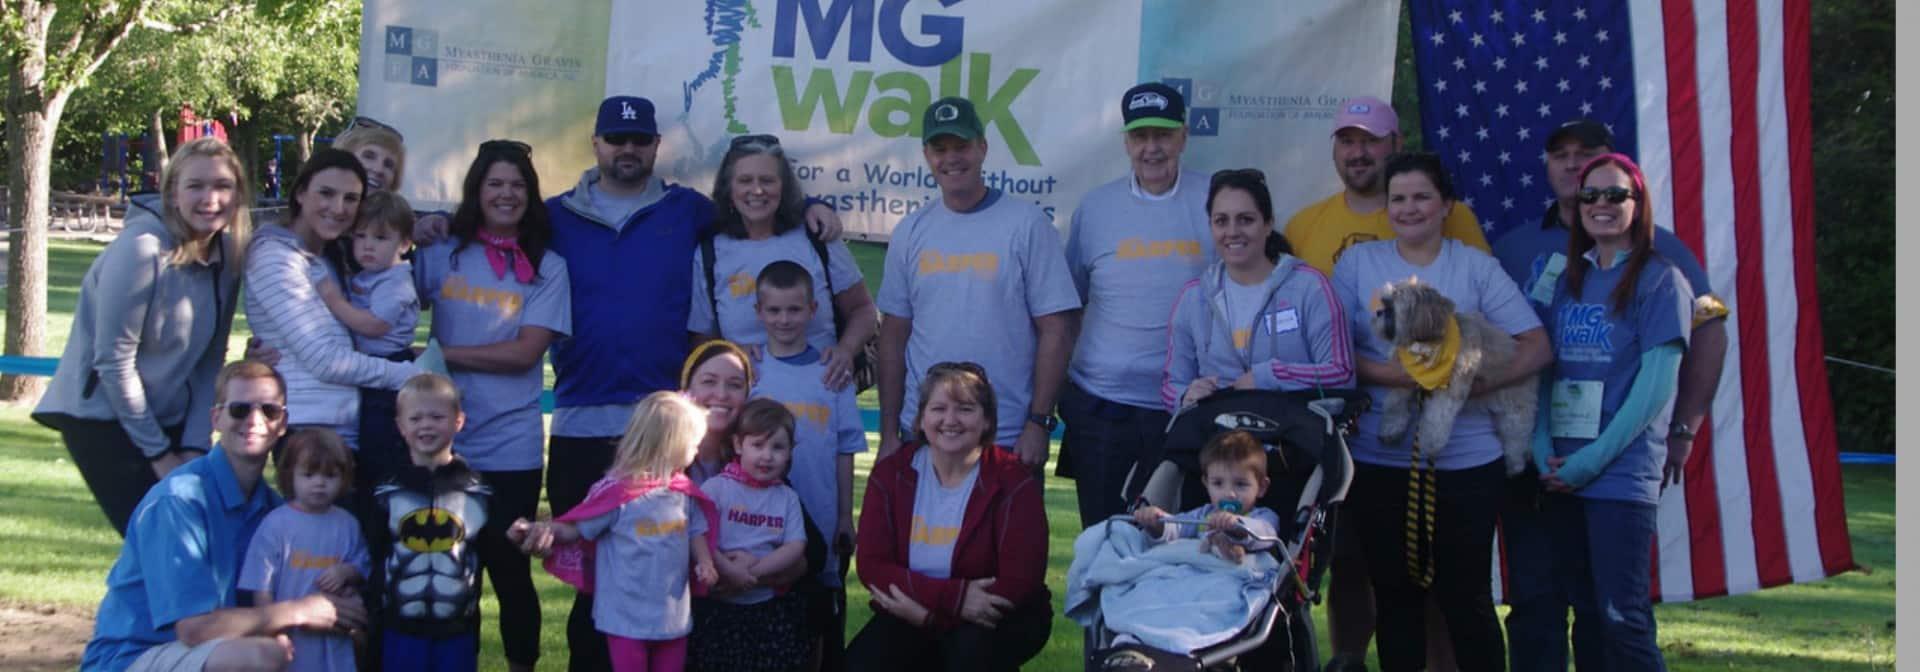 Portland MG Walk 2015